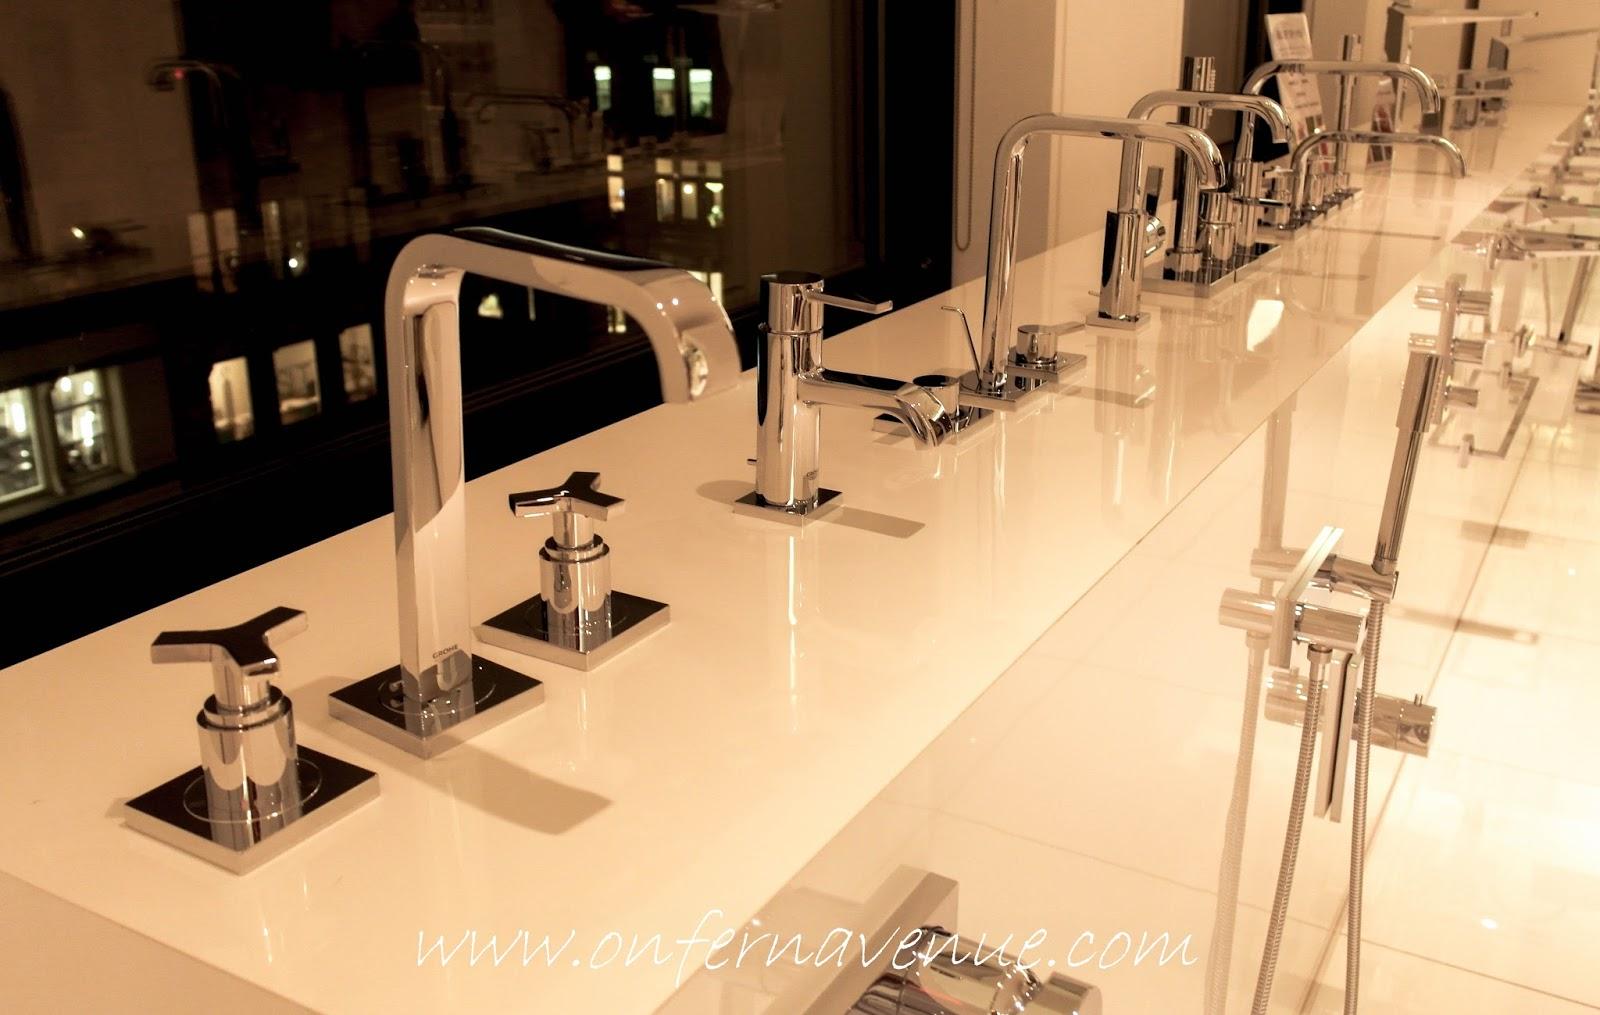 Grohe - Design Showroom & Blue Chill & Sparkling - Lynn Fern